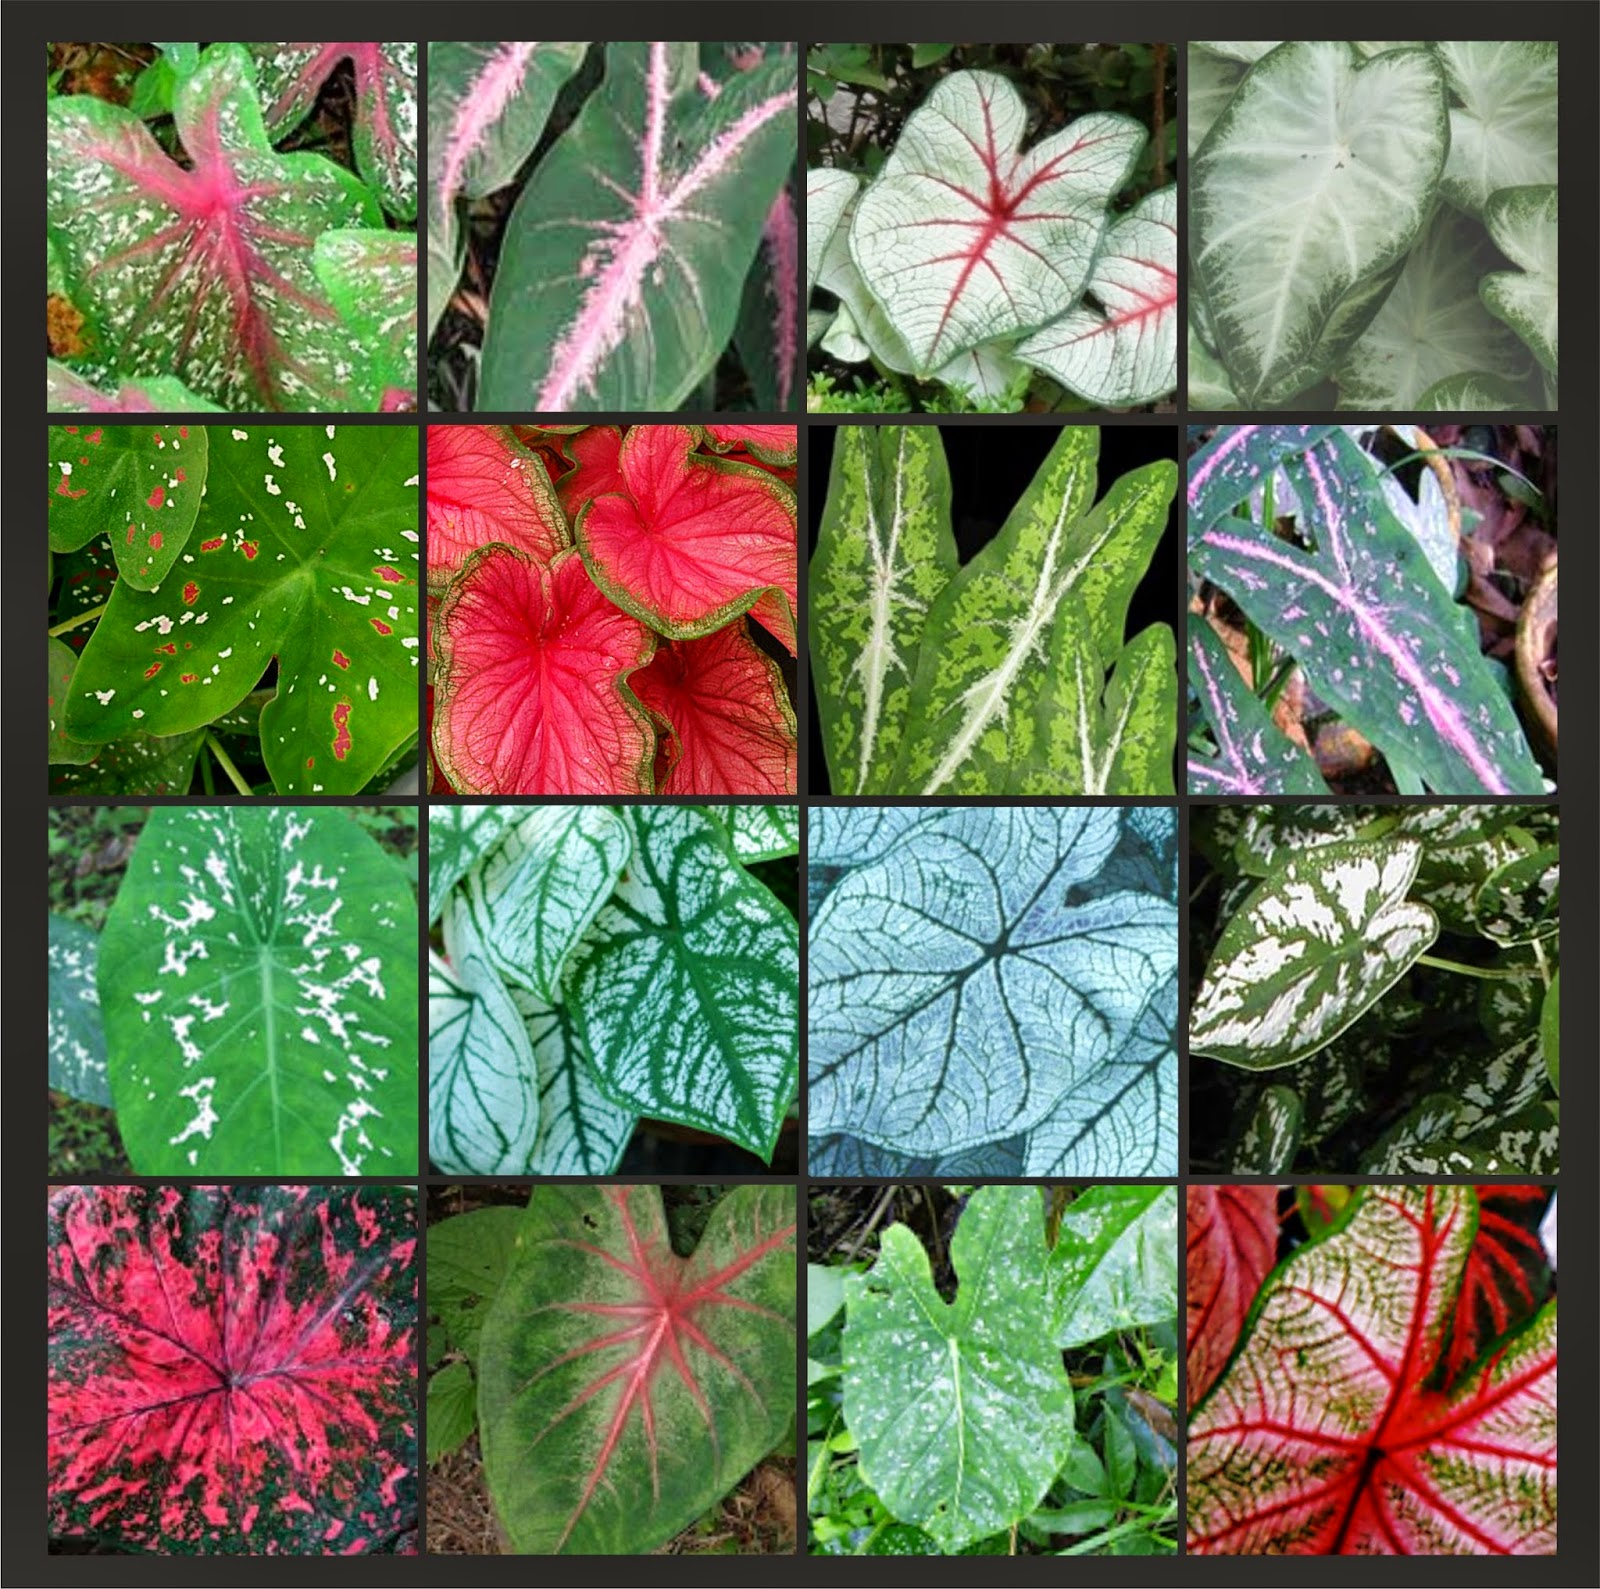 v e r d e c h a c o: Ornamentales en nuestros jardines 4